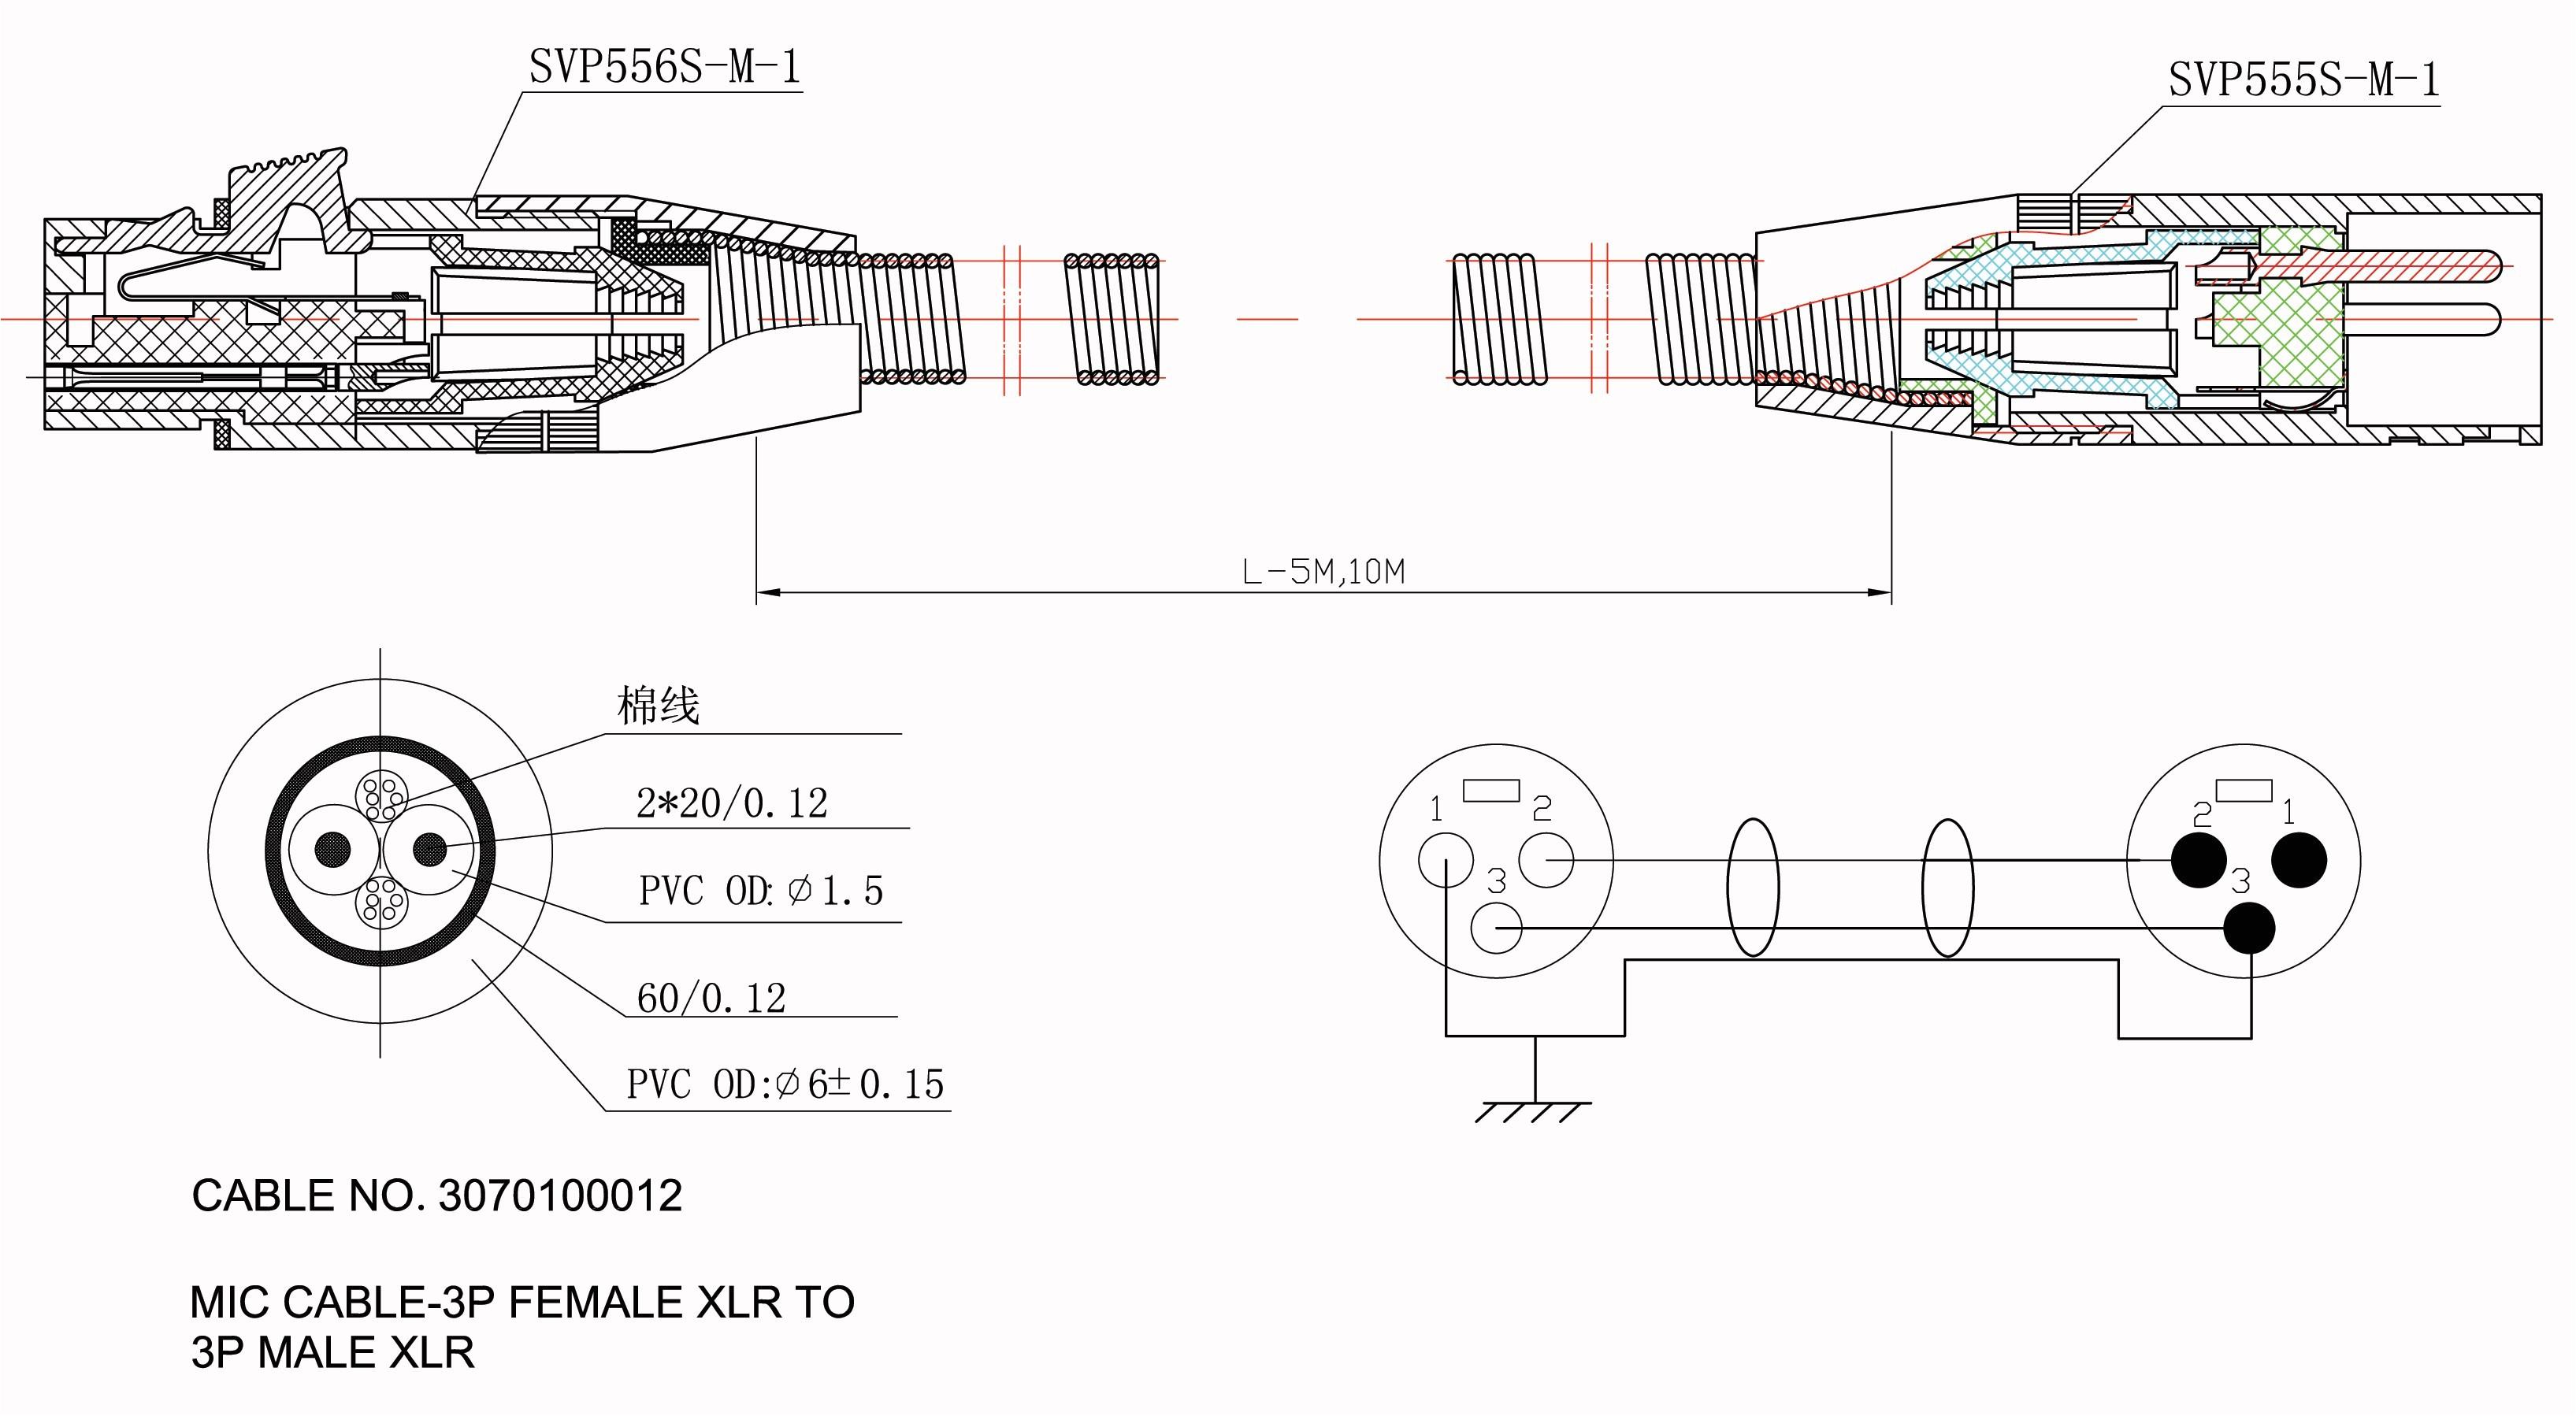 110cc pit bike wiring diagram awesome gongyu 125cc wire diagram 110cc pit bike wiring diagram elegant